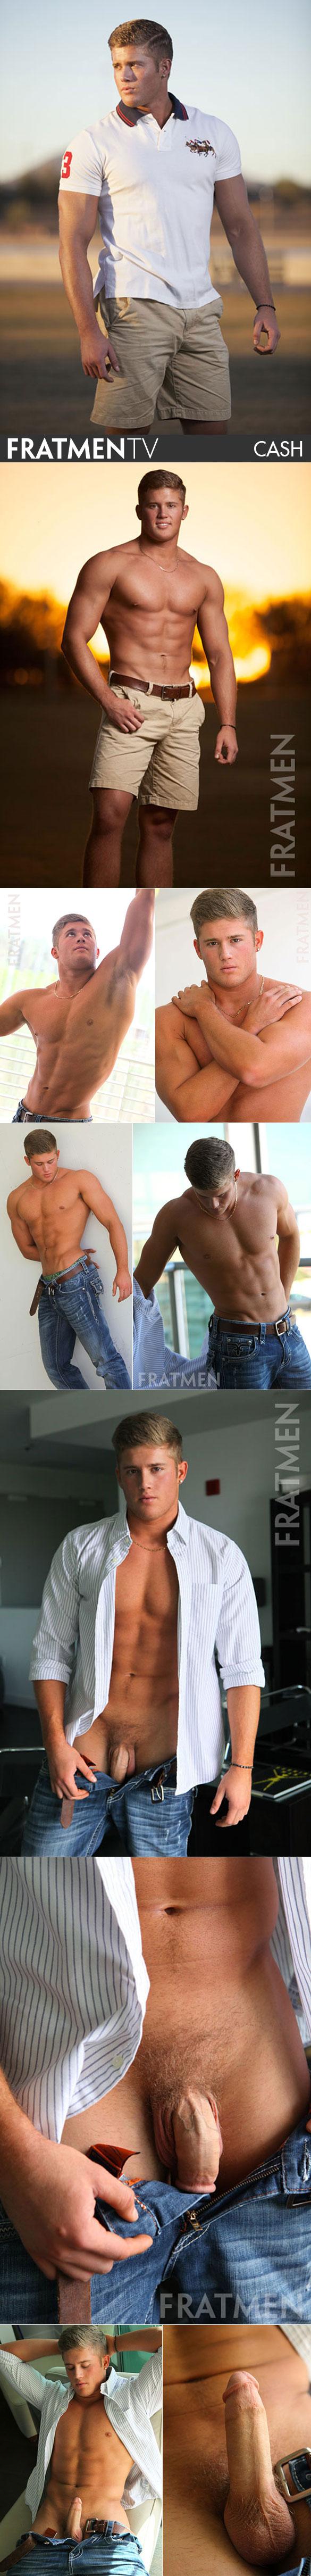 Fratmen.tv: Muscle jock Cash busts a nut